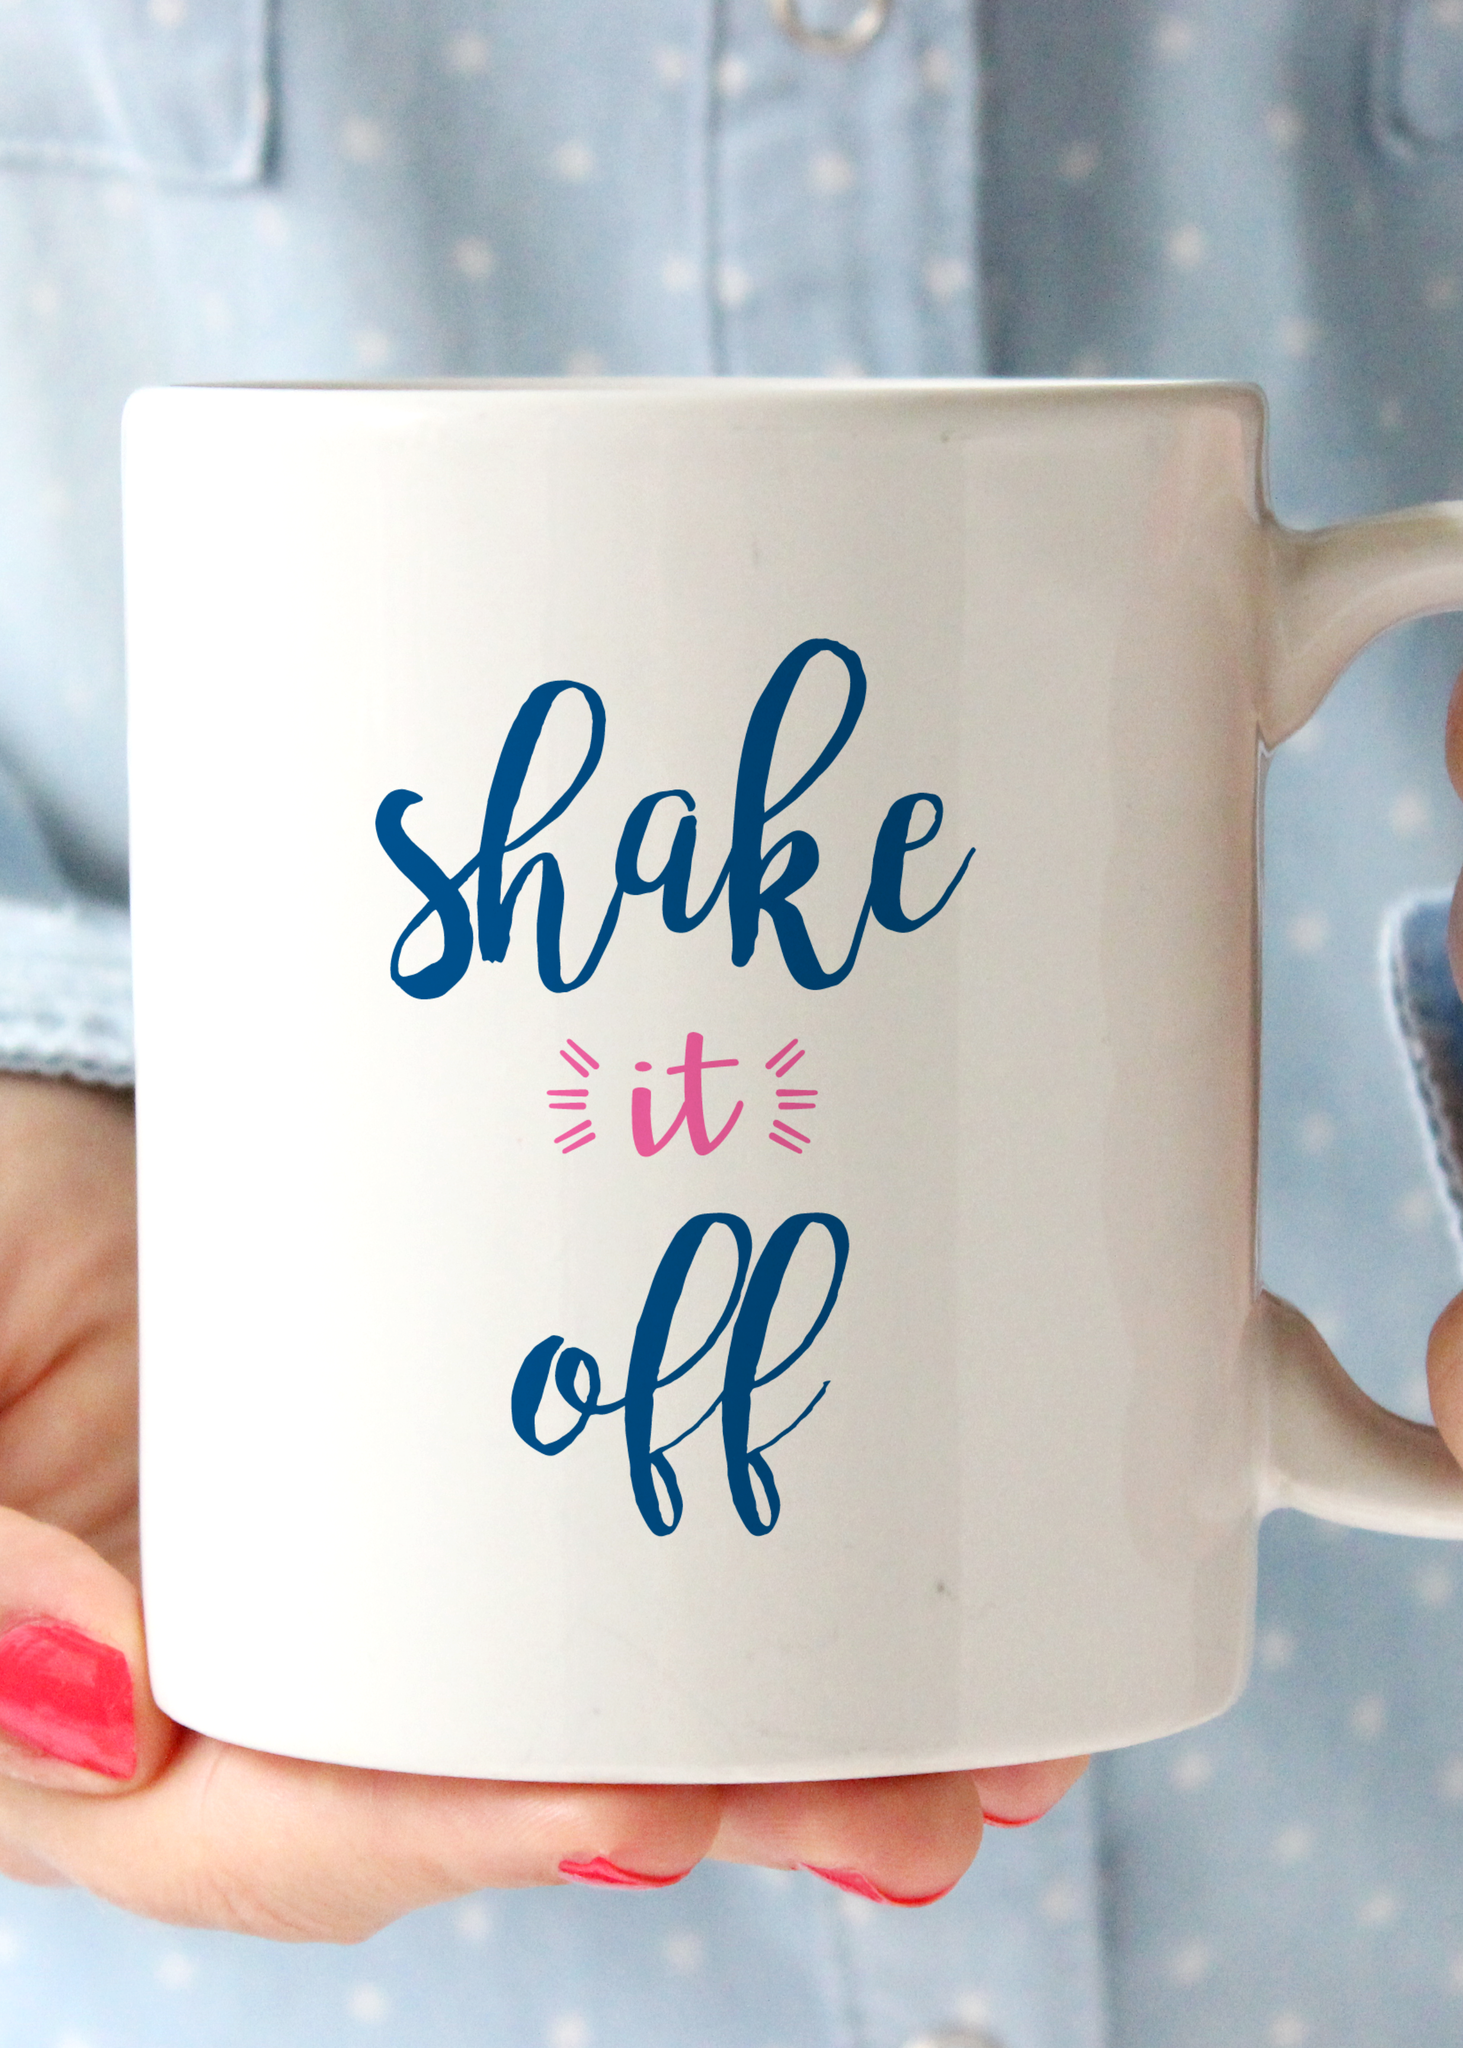 Robin Zingone Heart Of Love Personalized Coffee Mug